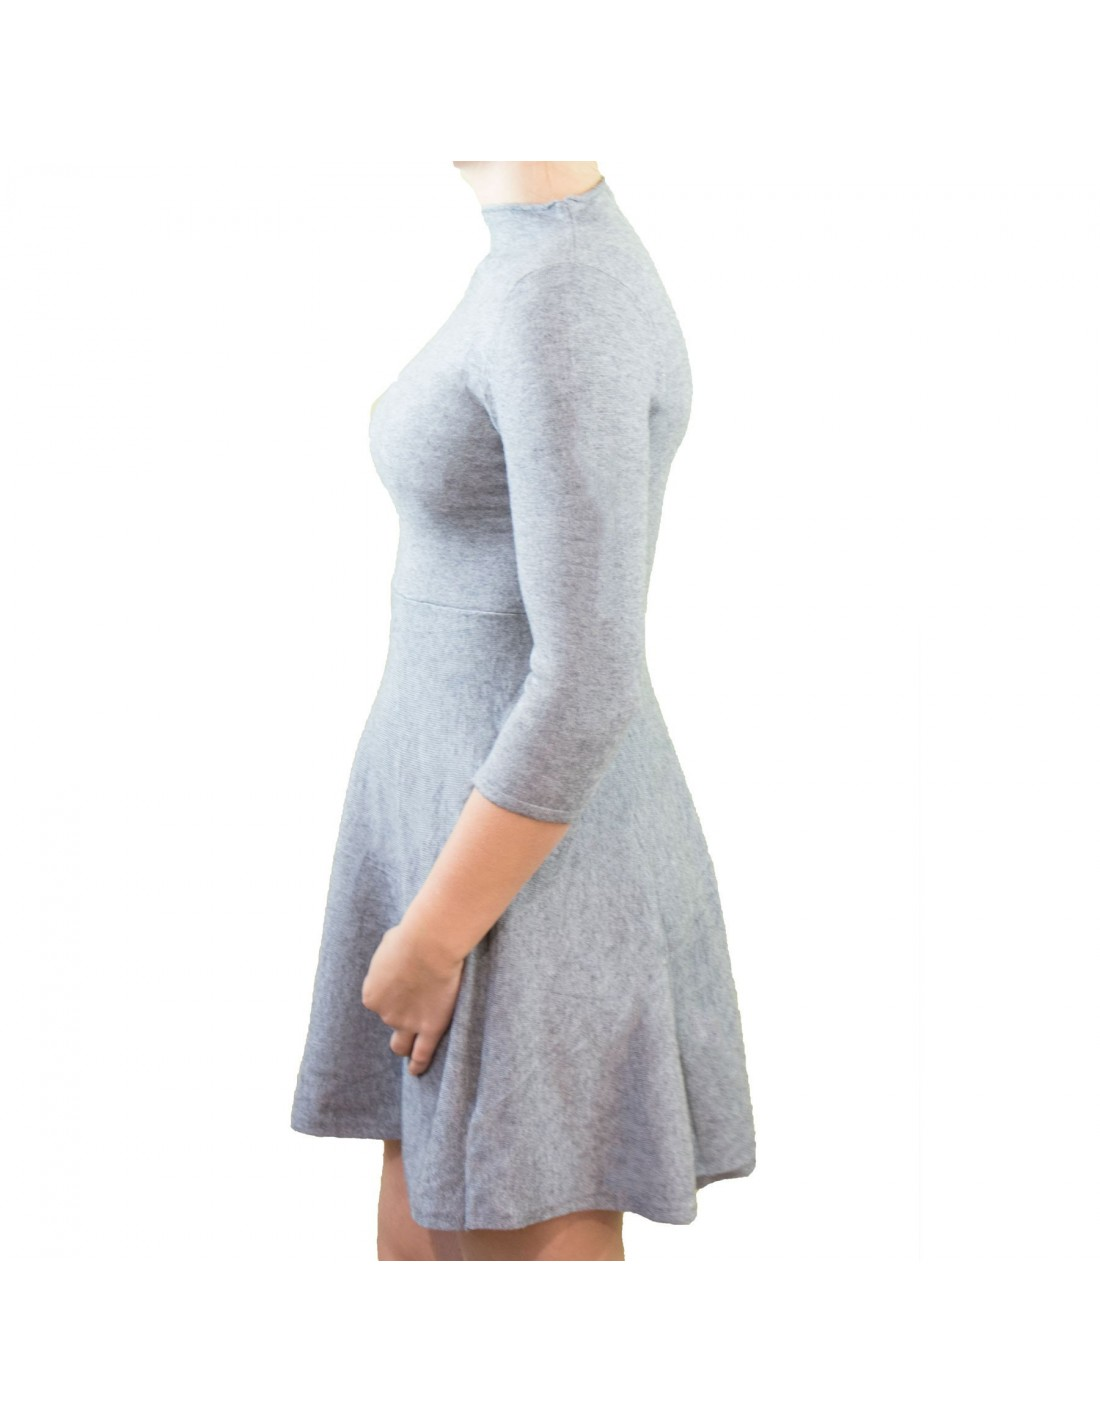 39cb47fcf79 Robe courte aspect laine pull manches 3 4 col montant